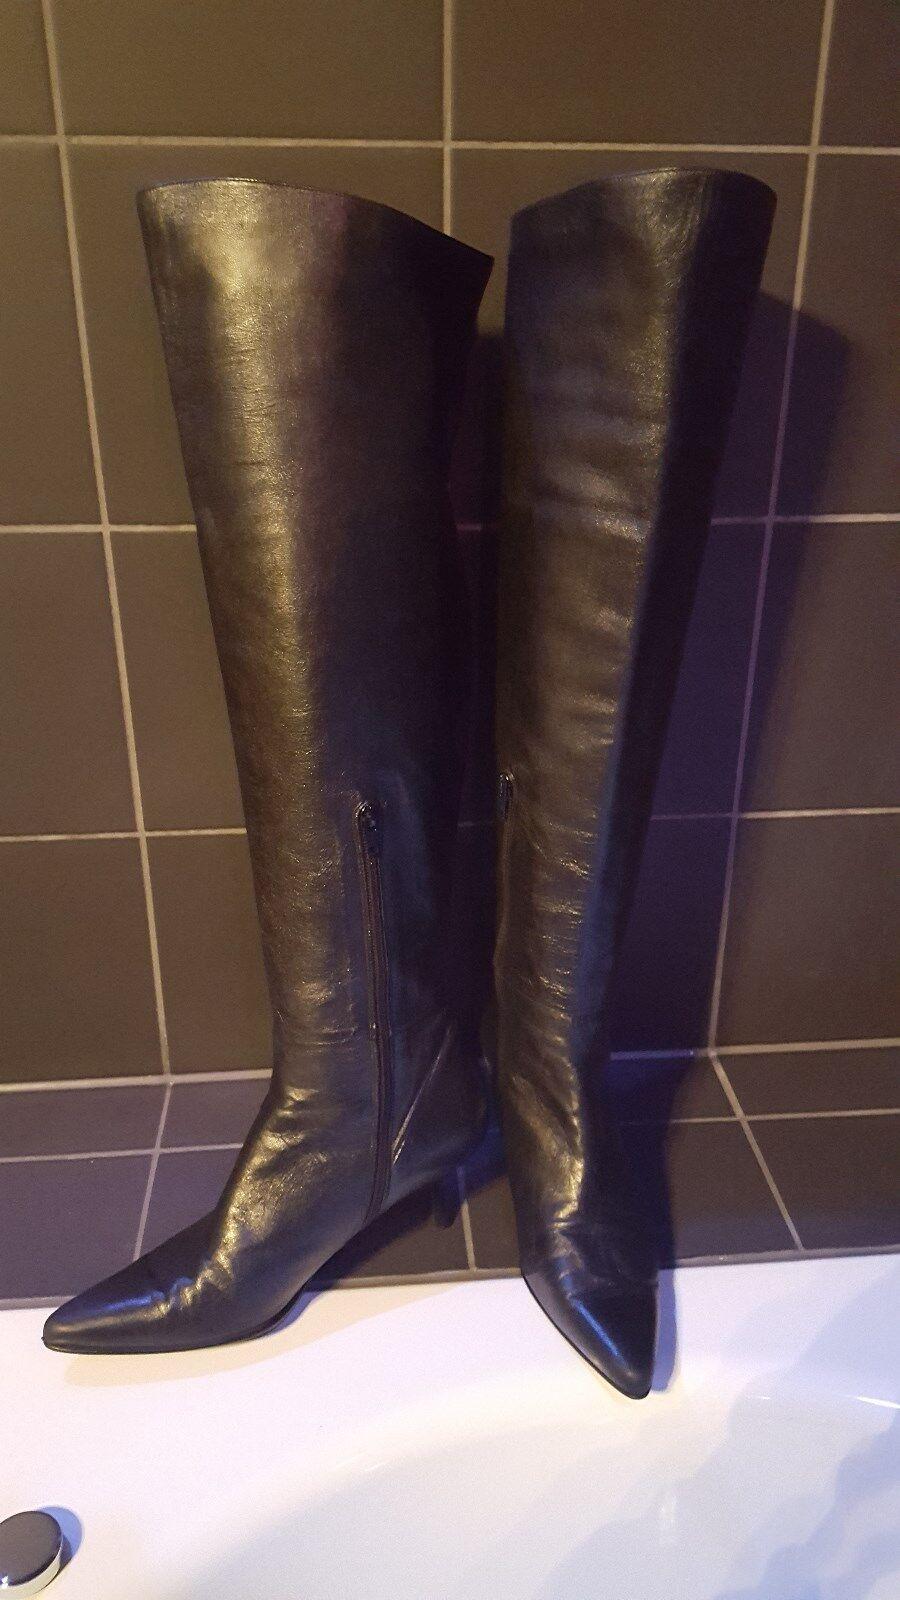 Overknee Stiefel Gr. Stuart Weitzman Echt Leder Gr. Stiefel 38.5 2e2413